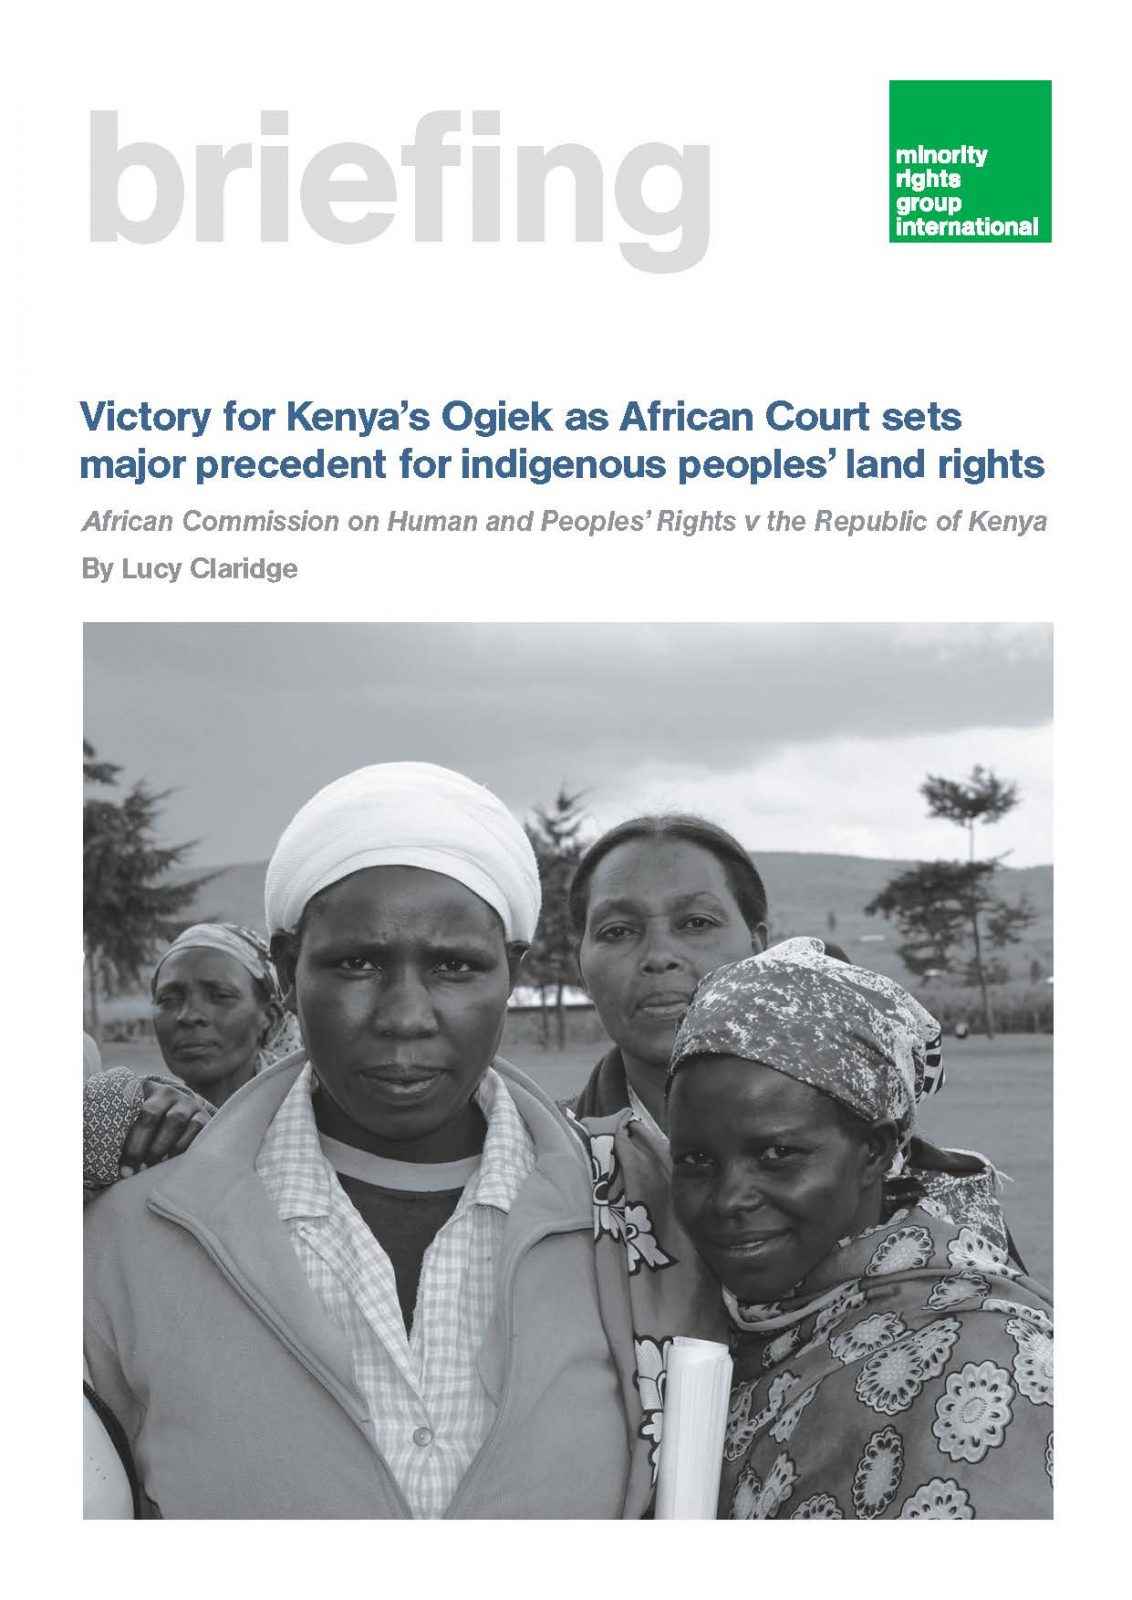 Victory for Kenya'sOgiekas African Court sets major precedent for indigenous peoples' land rights